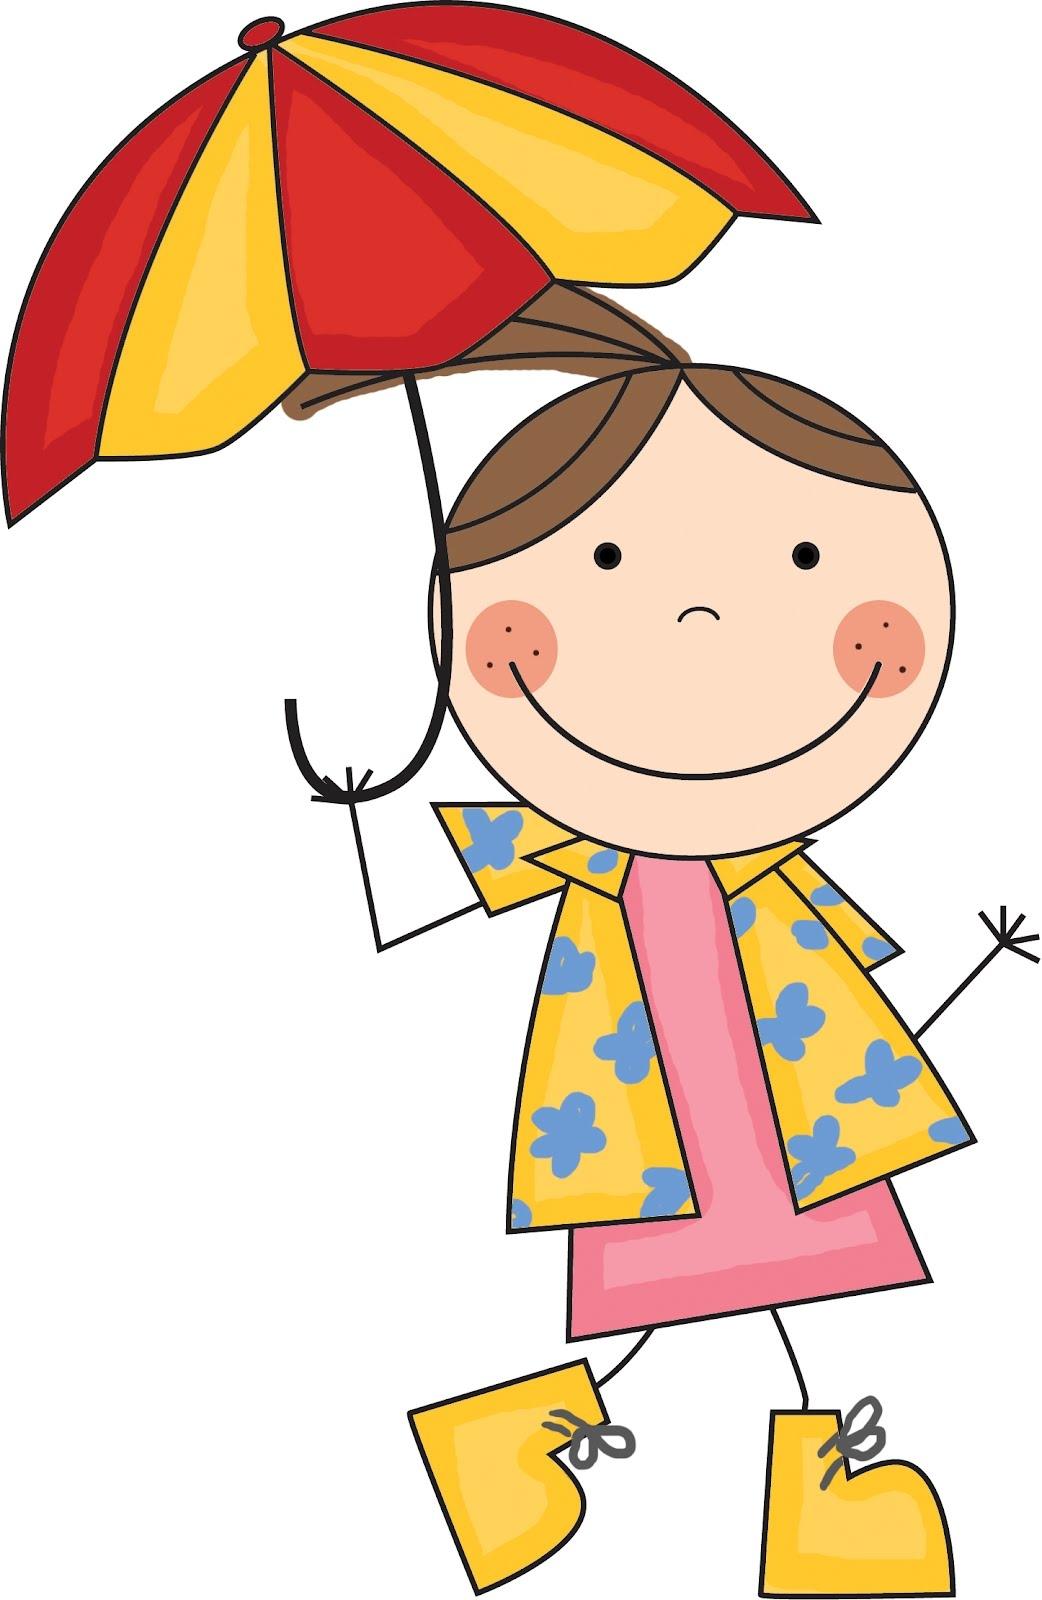 Umbrella clipart child With Kid Kid Clipart art